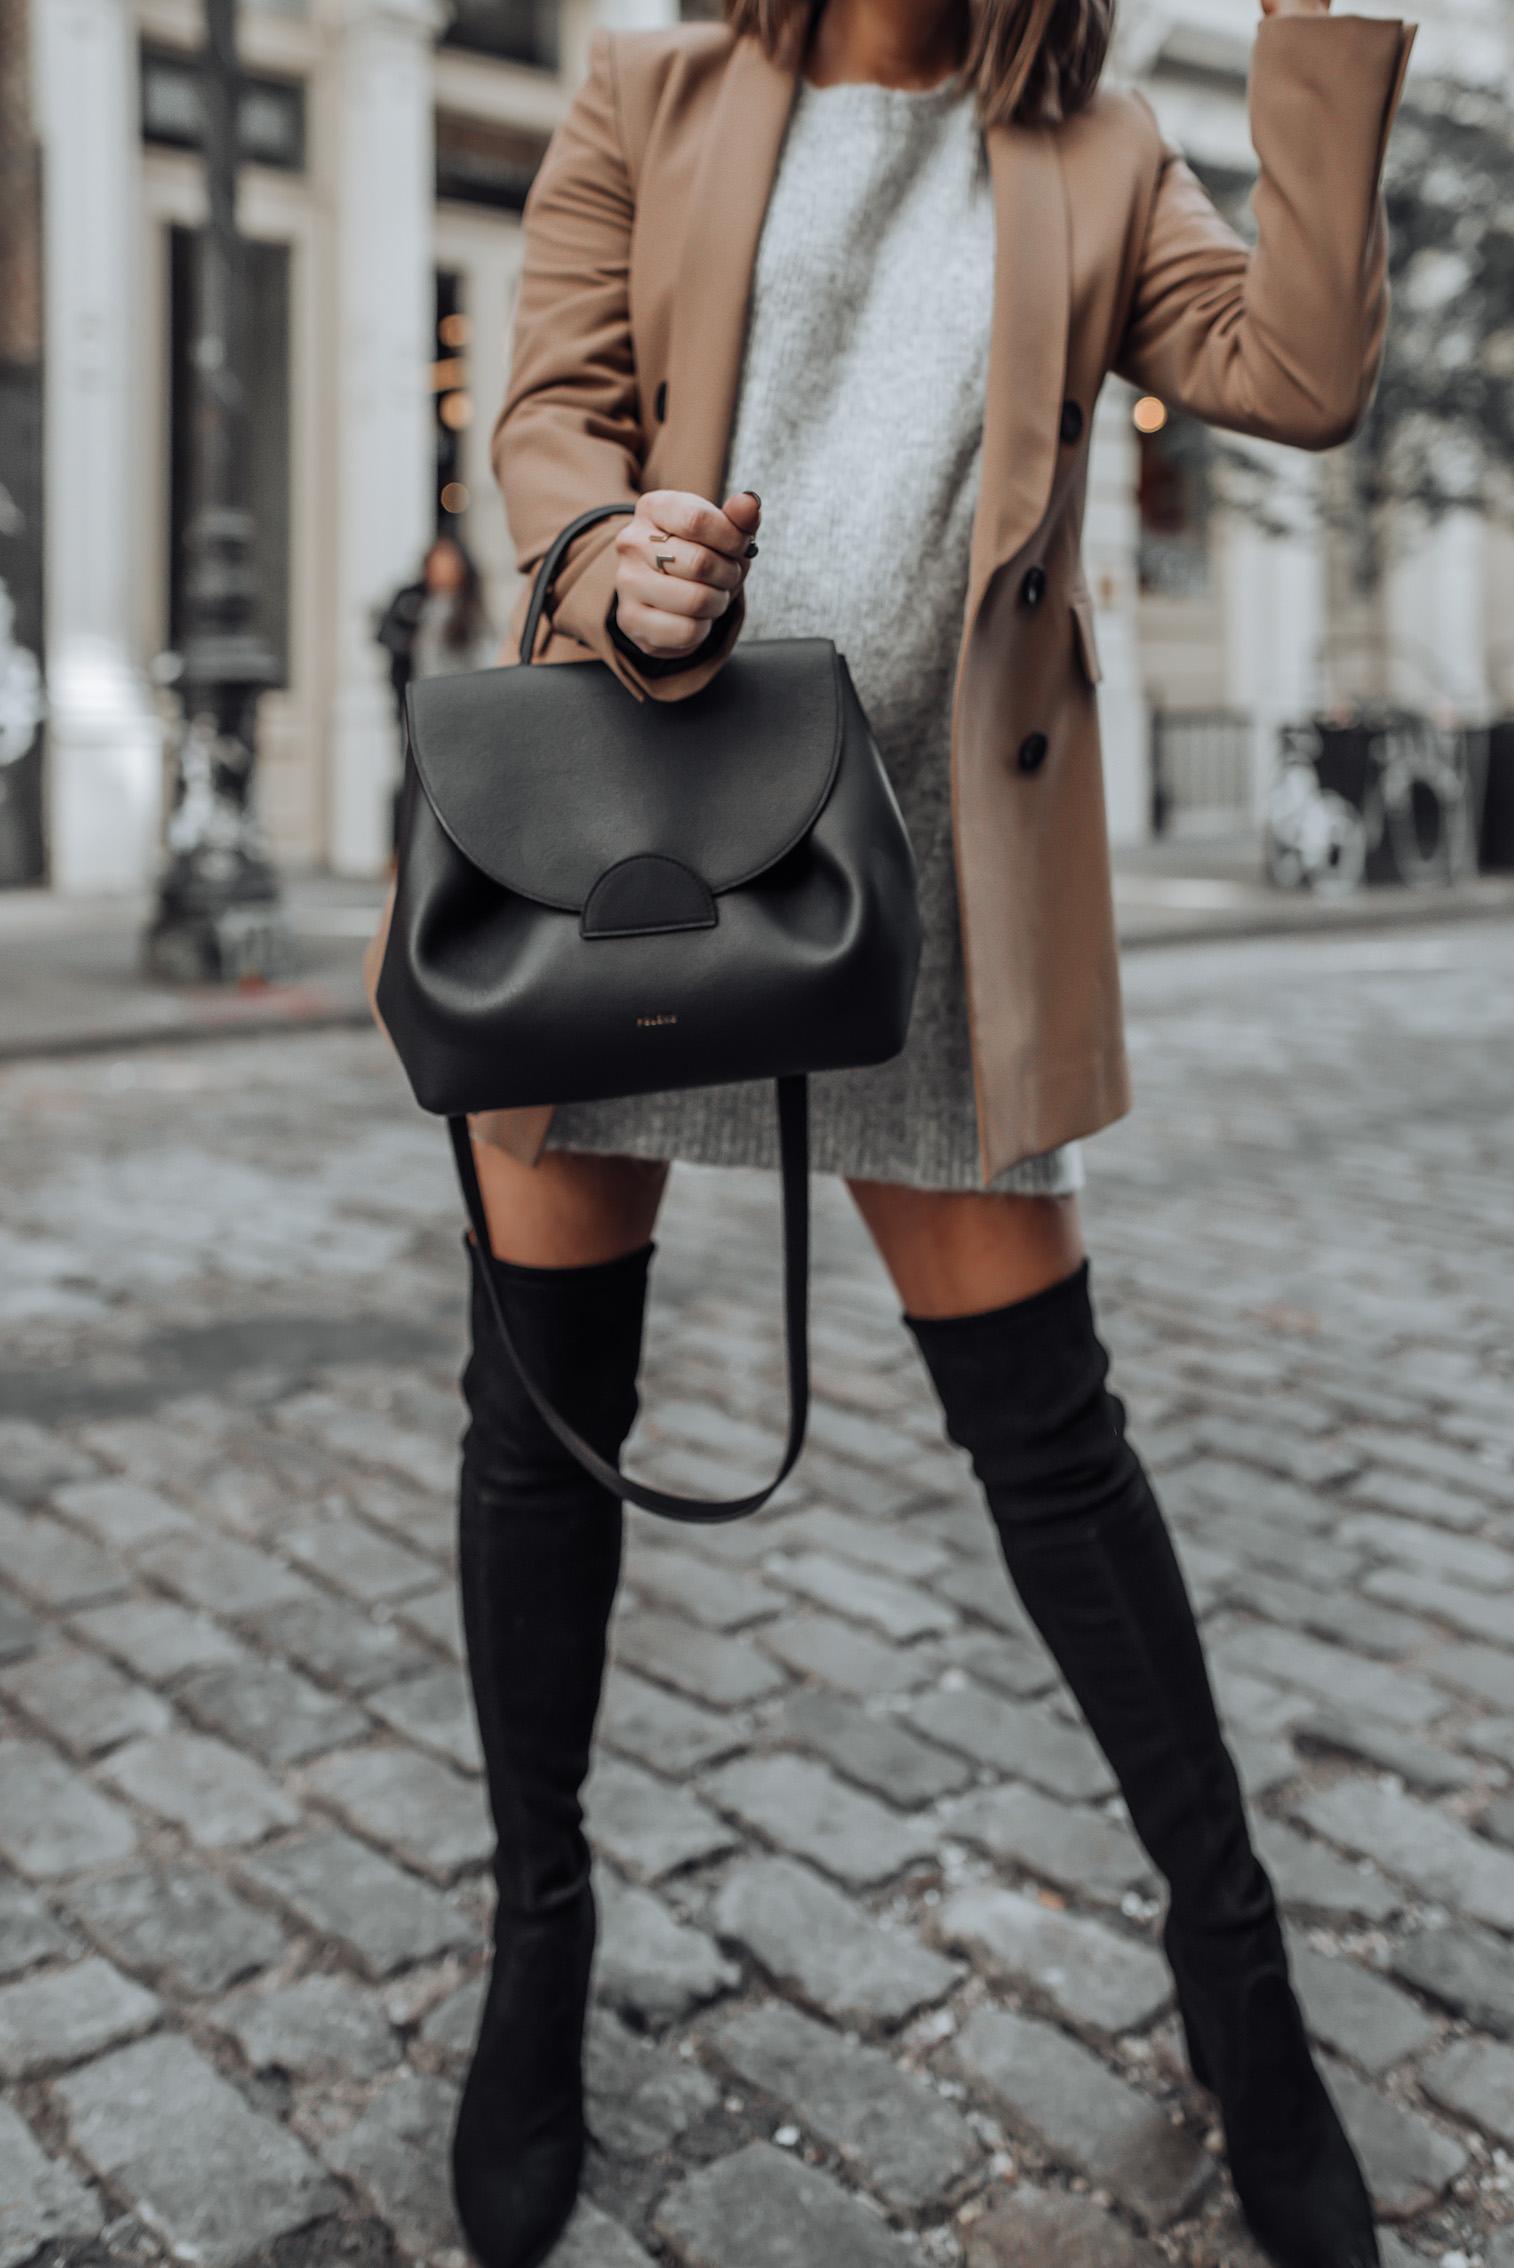 Grey and camel |Grey Sweater | Stuart Weitzman Funland (similar) | Zara Blazer (similar) | Bag C/O Polene Paris #streetstyle #nycblog #sohonyc #travel